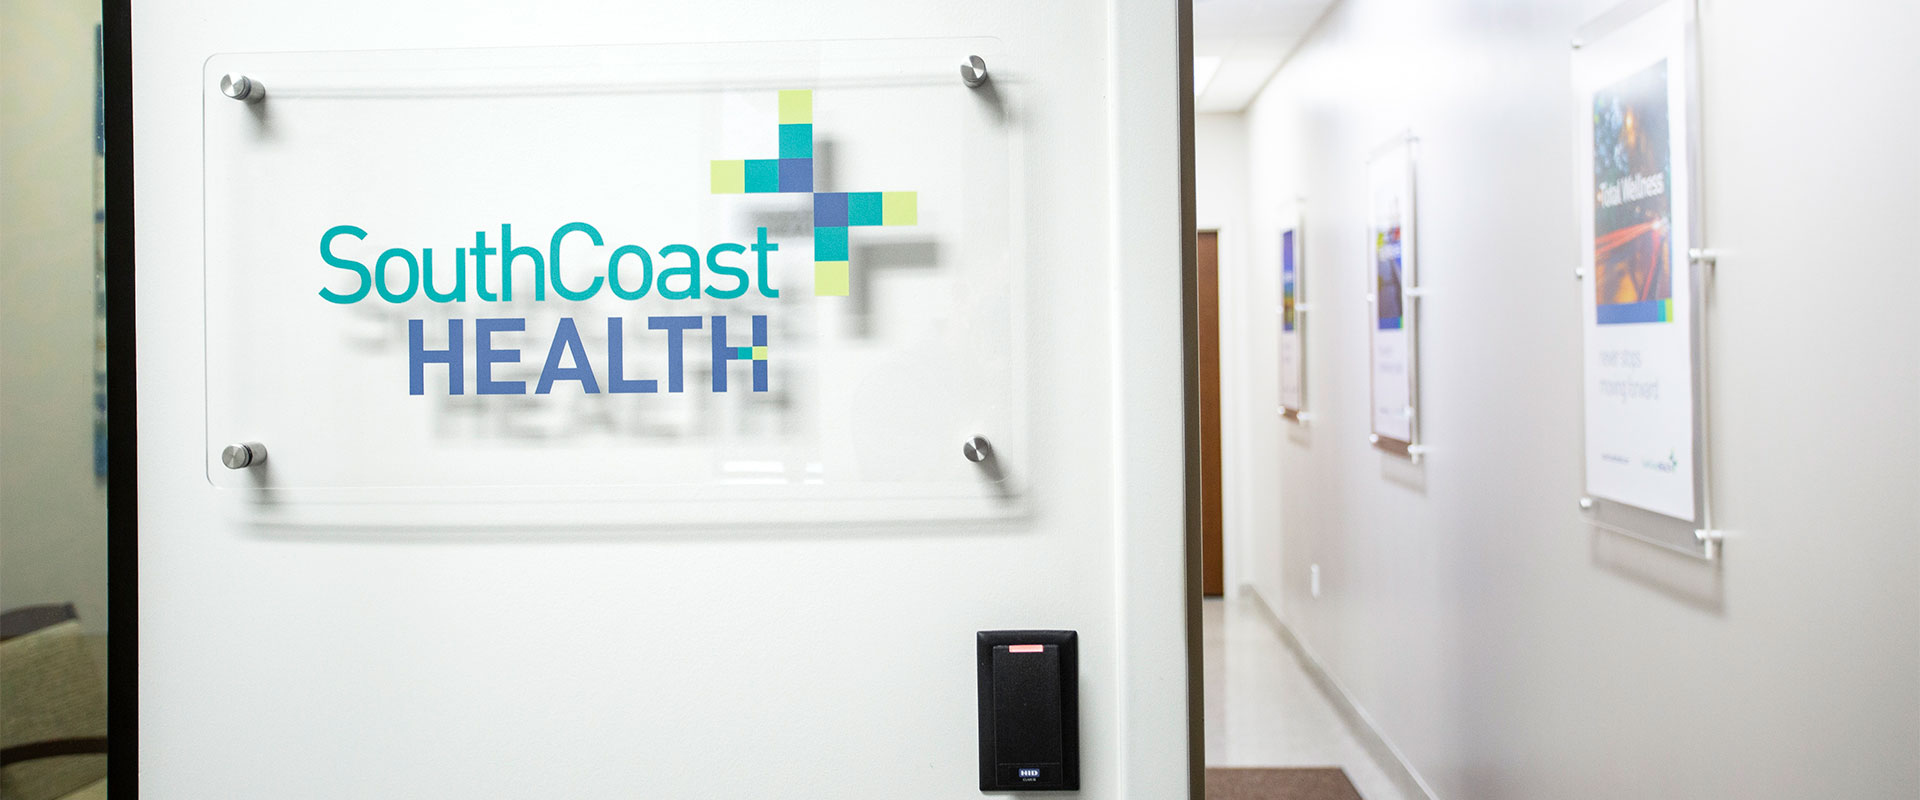 Free Onsite Employee Healthcare – An Innovative Idea! Waiting Area